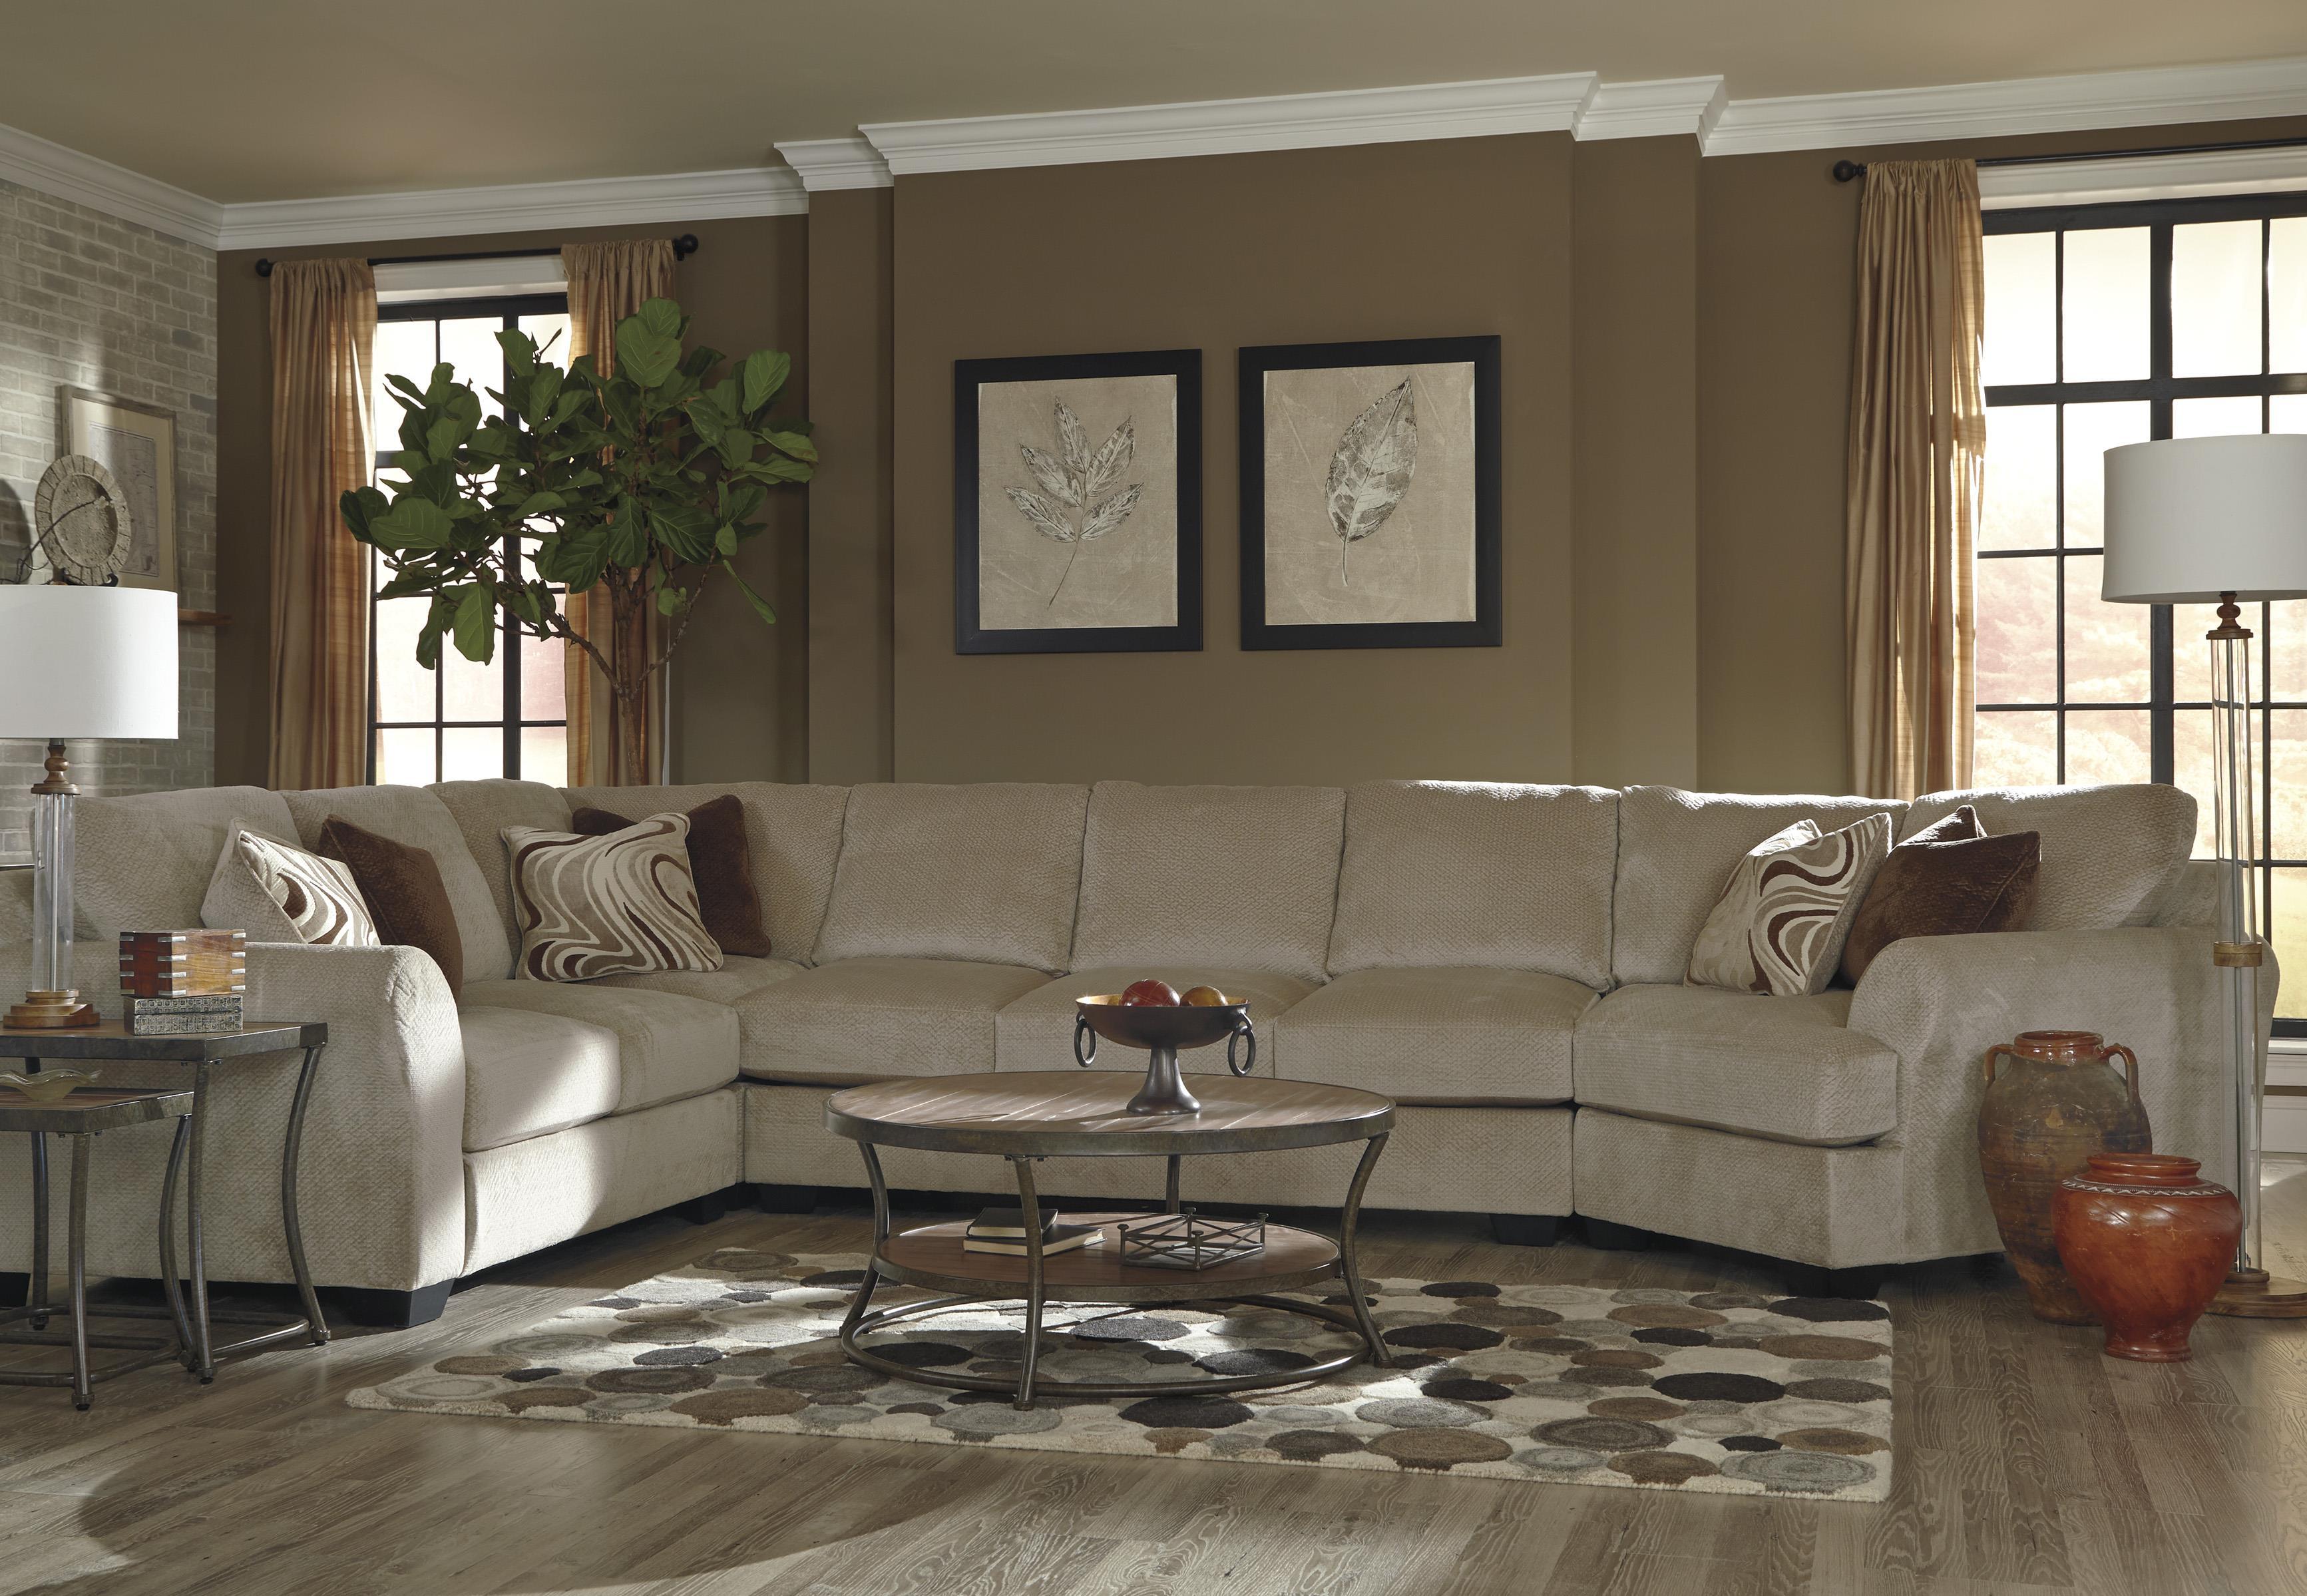 Ashley/Benchcraft Hazes 4-Piece Sectional w/ Armless Sofa & Cuddler - Item Number: 6570155+77+99+75